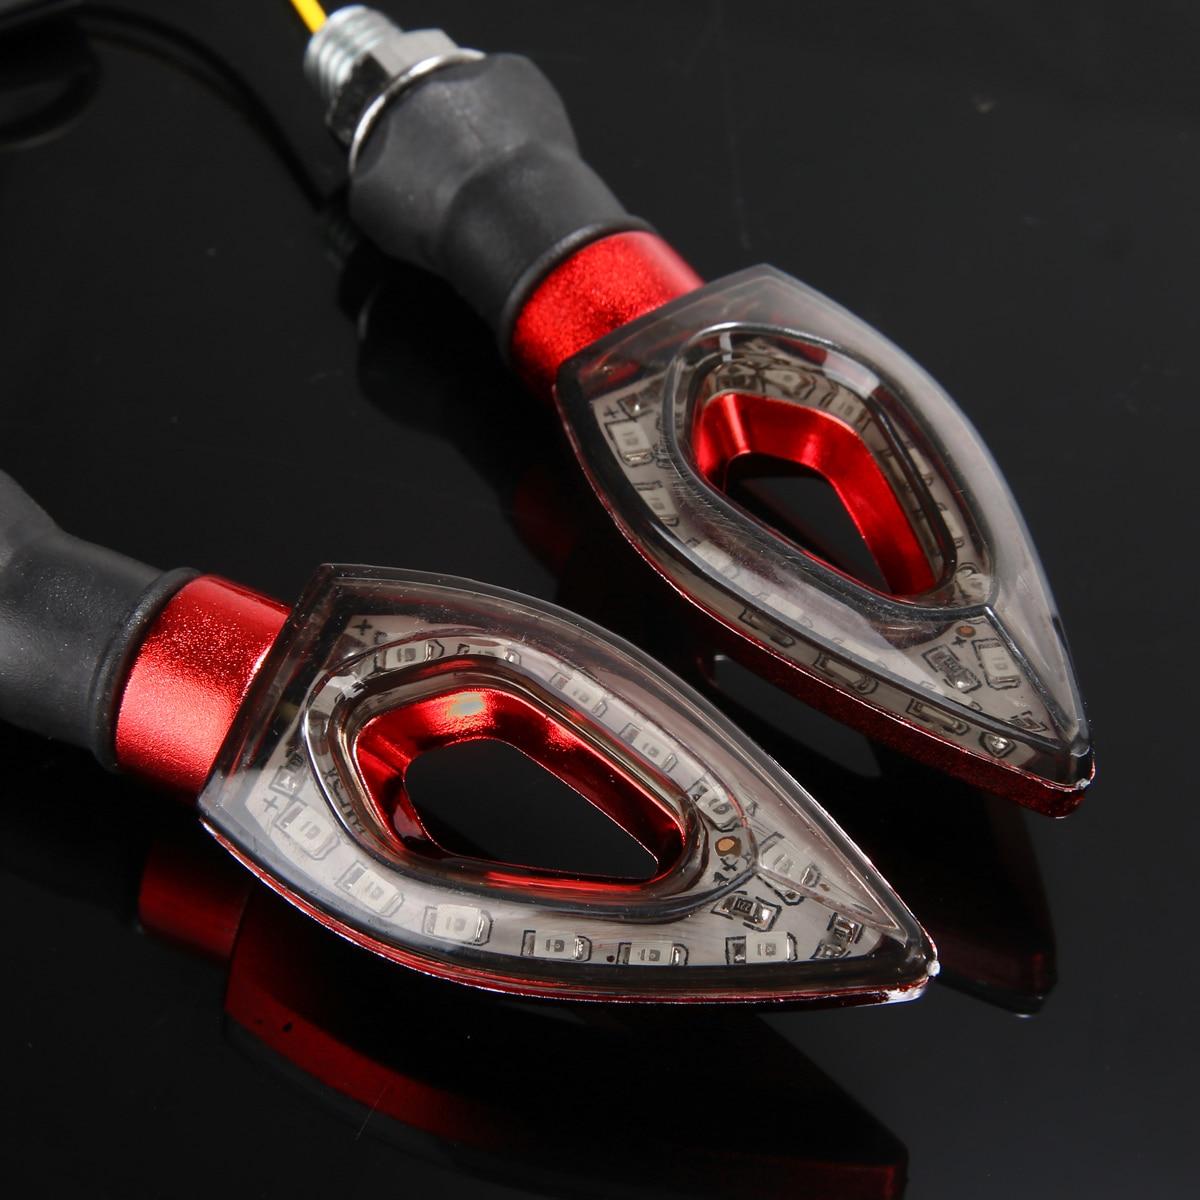 4pcs 12V Amber Yellow Universal Motorcycle Lamp LED Turn Signal Light Indicators Blinker High Quality